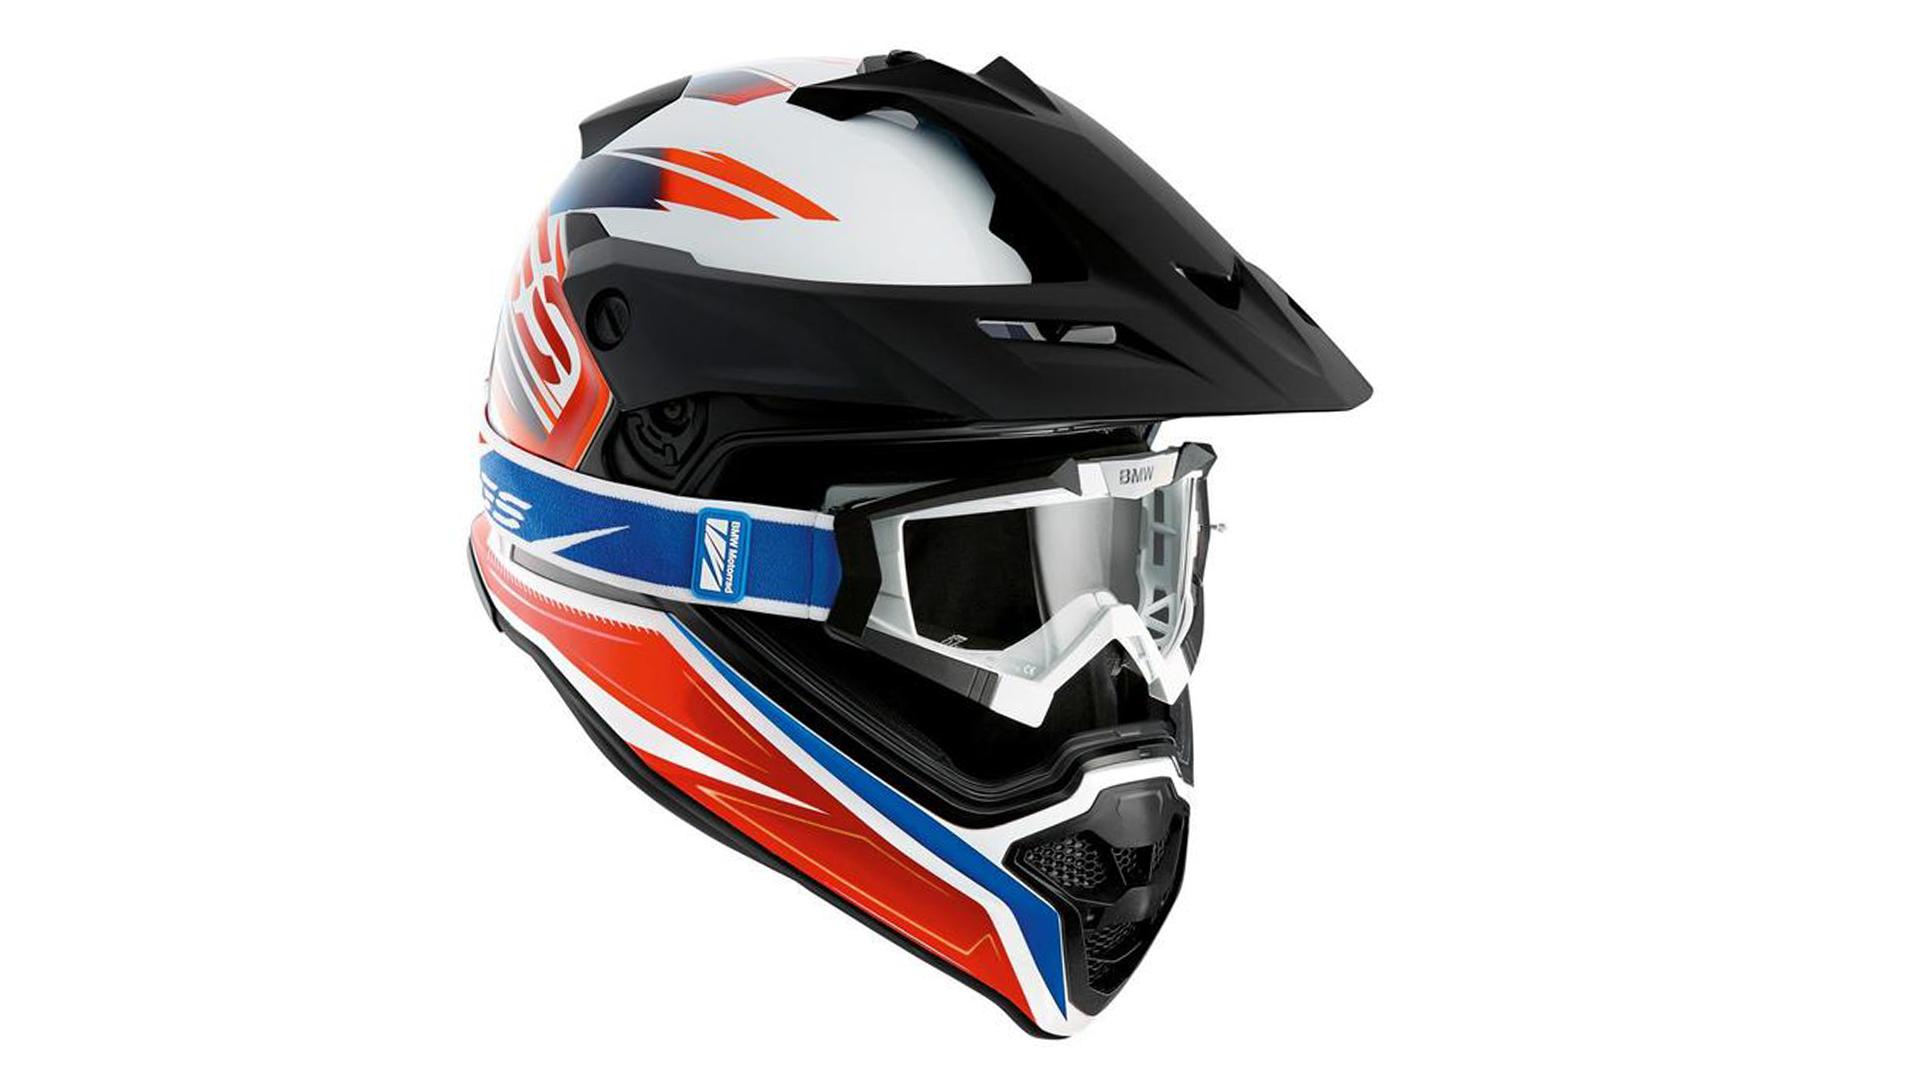 wp_BMW-GS-enduro-helmet_0002_bmw-helm-gs-03